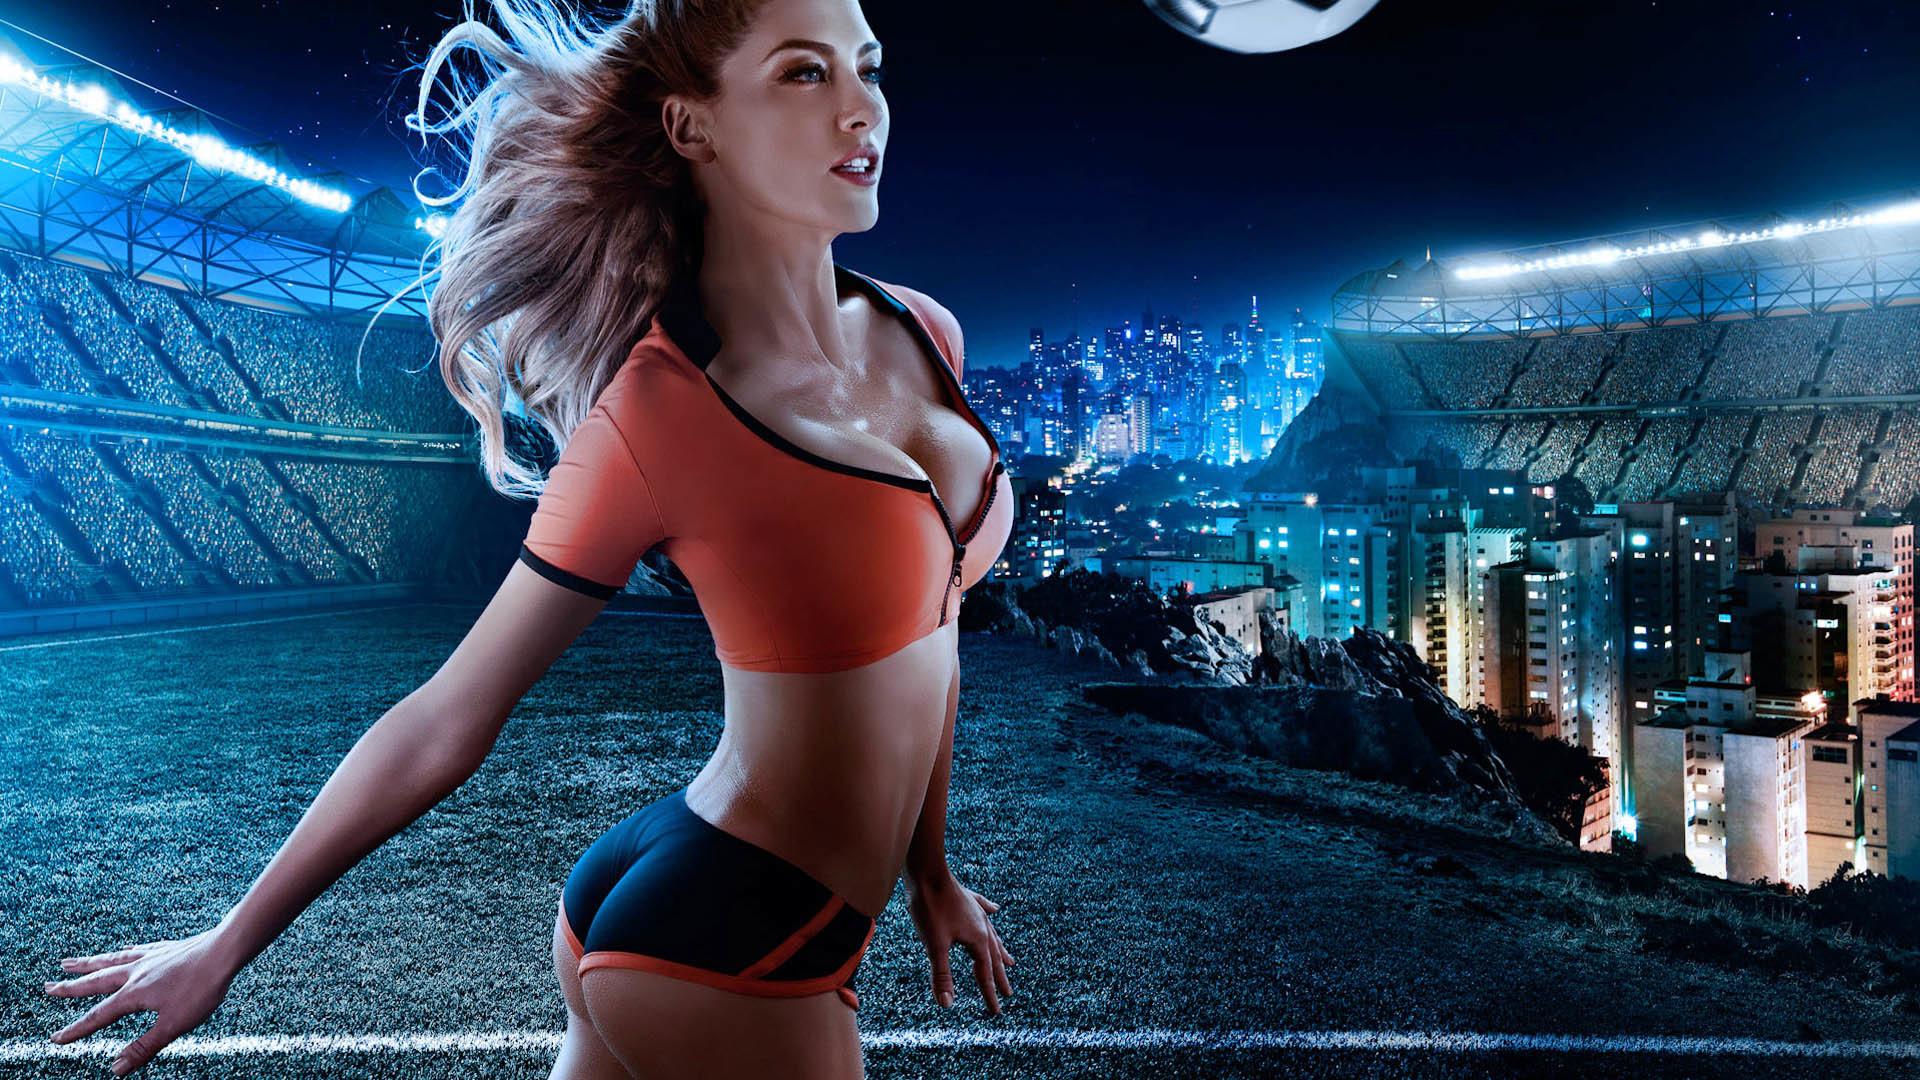 Football Desktop Wallpaper. Football Desktop Wallpaper 1920×1080